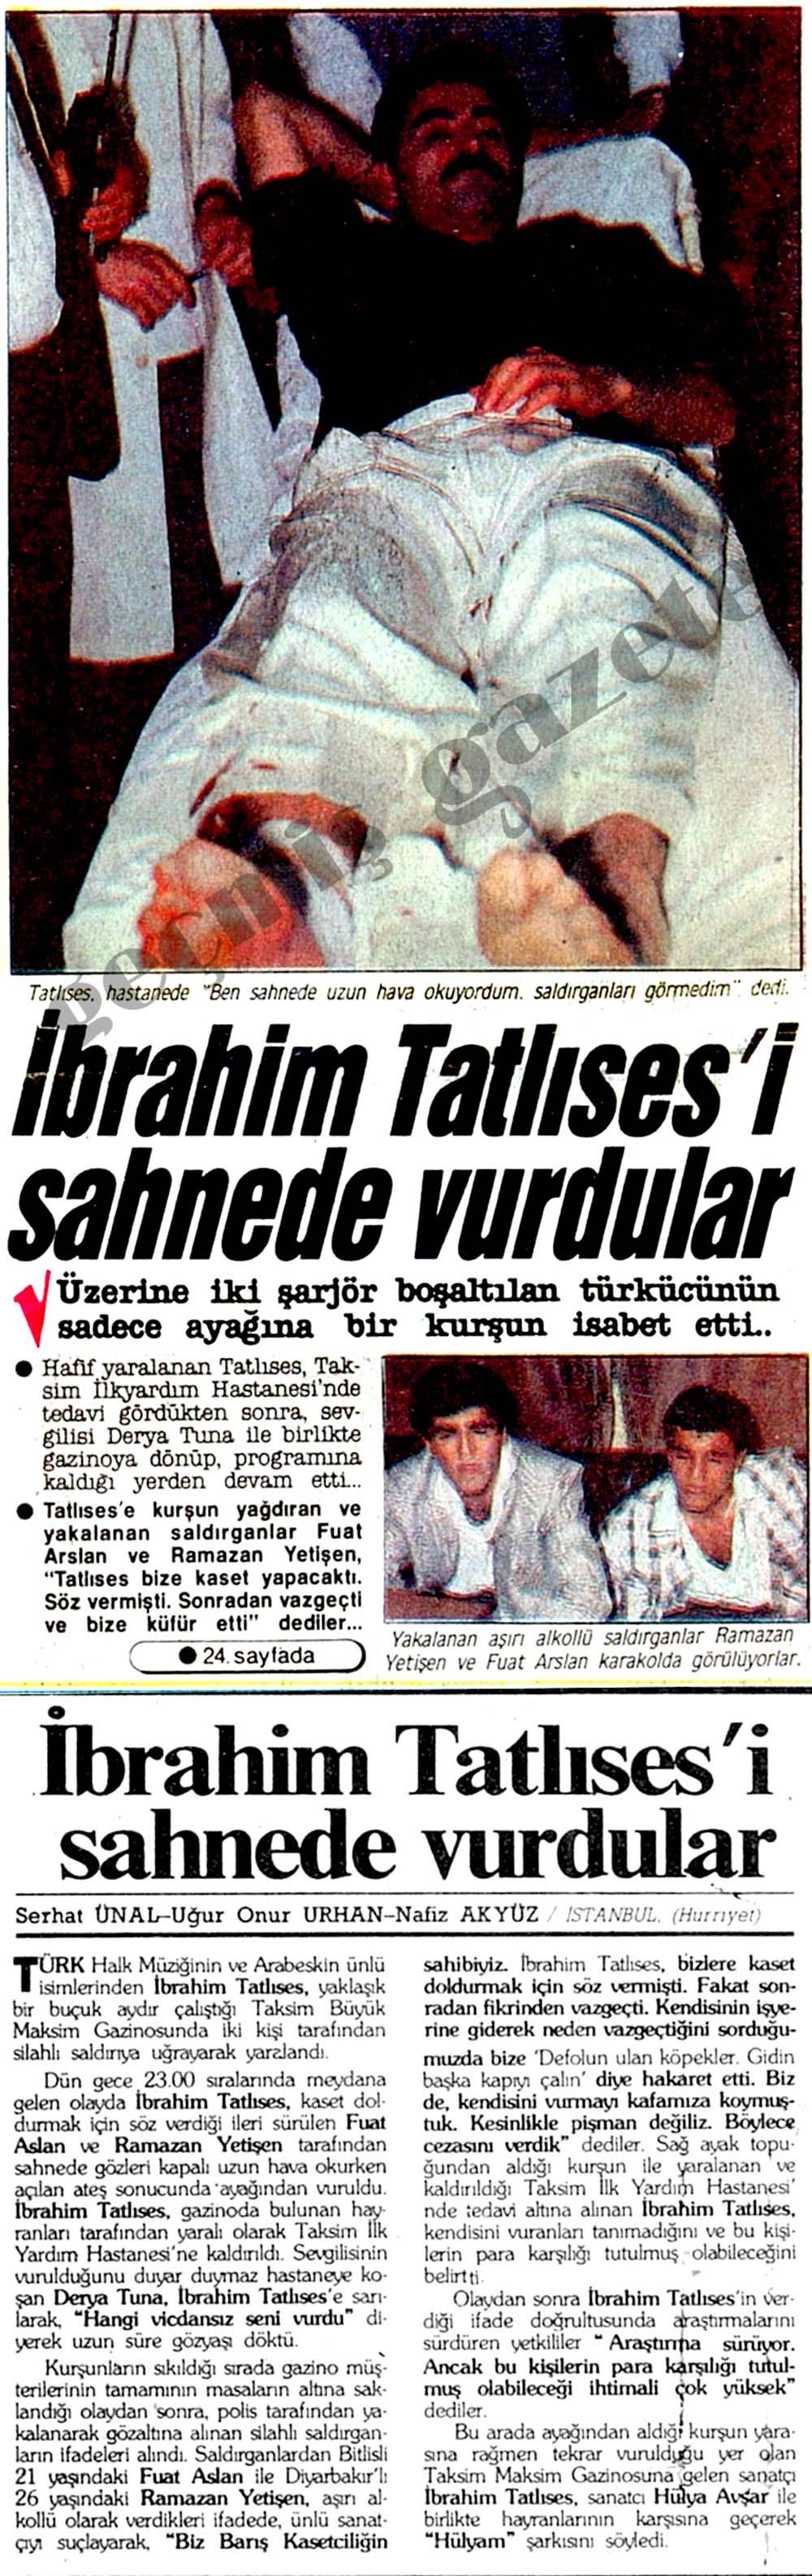 İbrahim Tatlıses'i sahnede vurdular